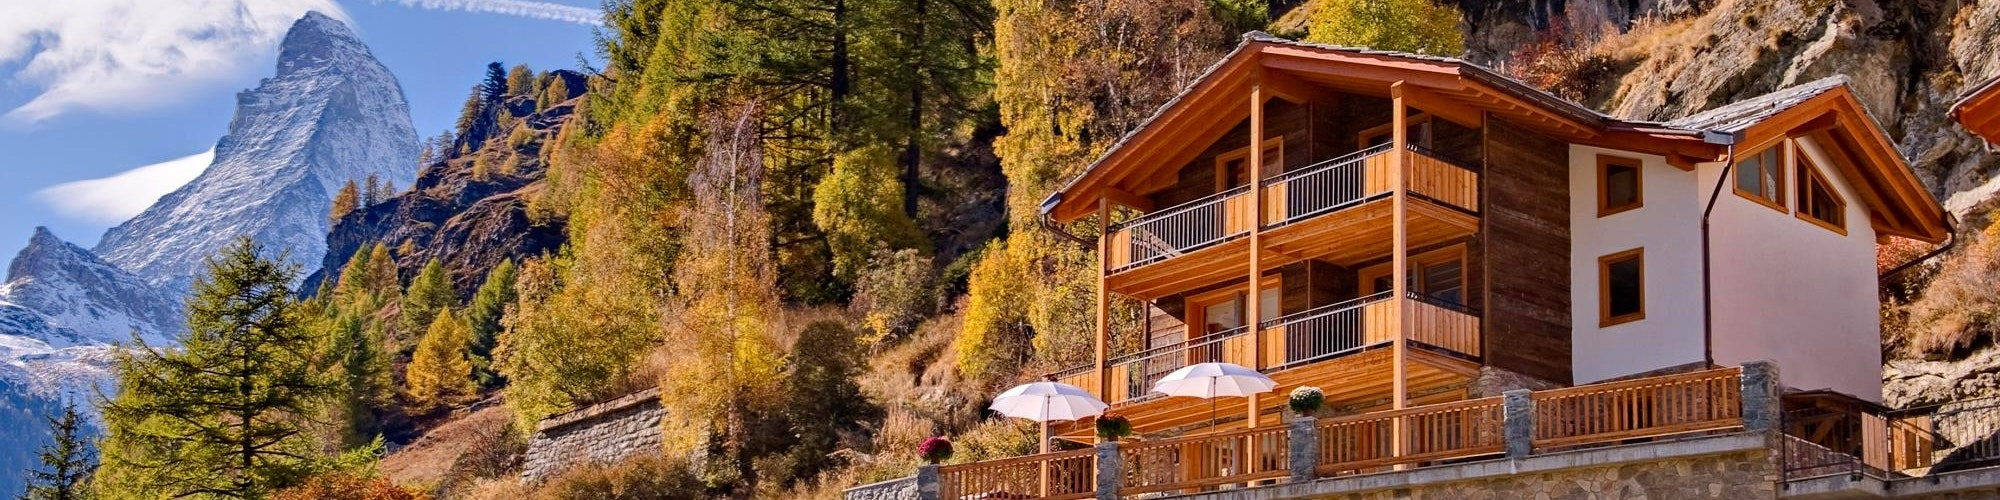 Holiday apartments in Zermatt